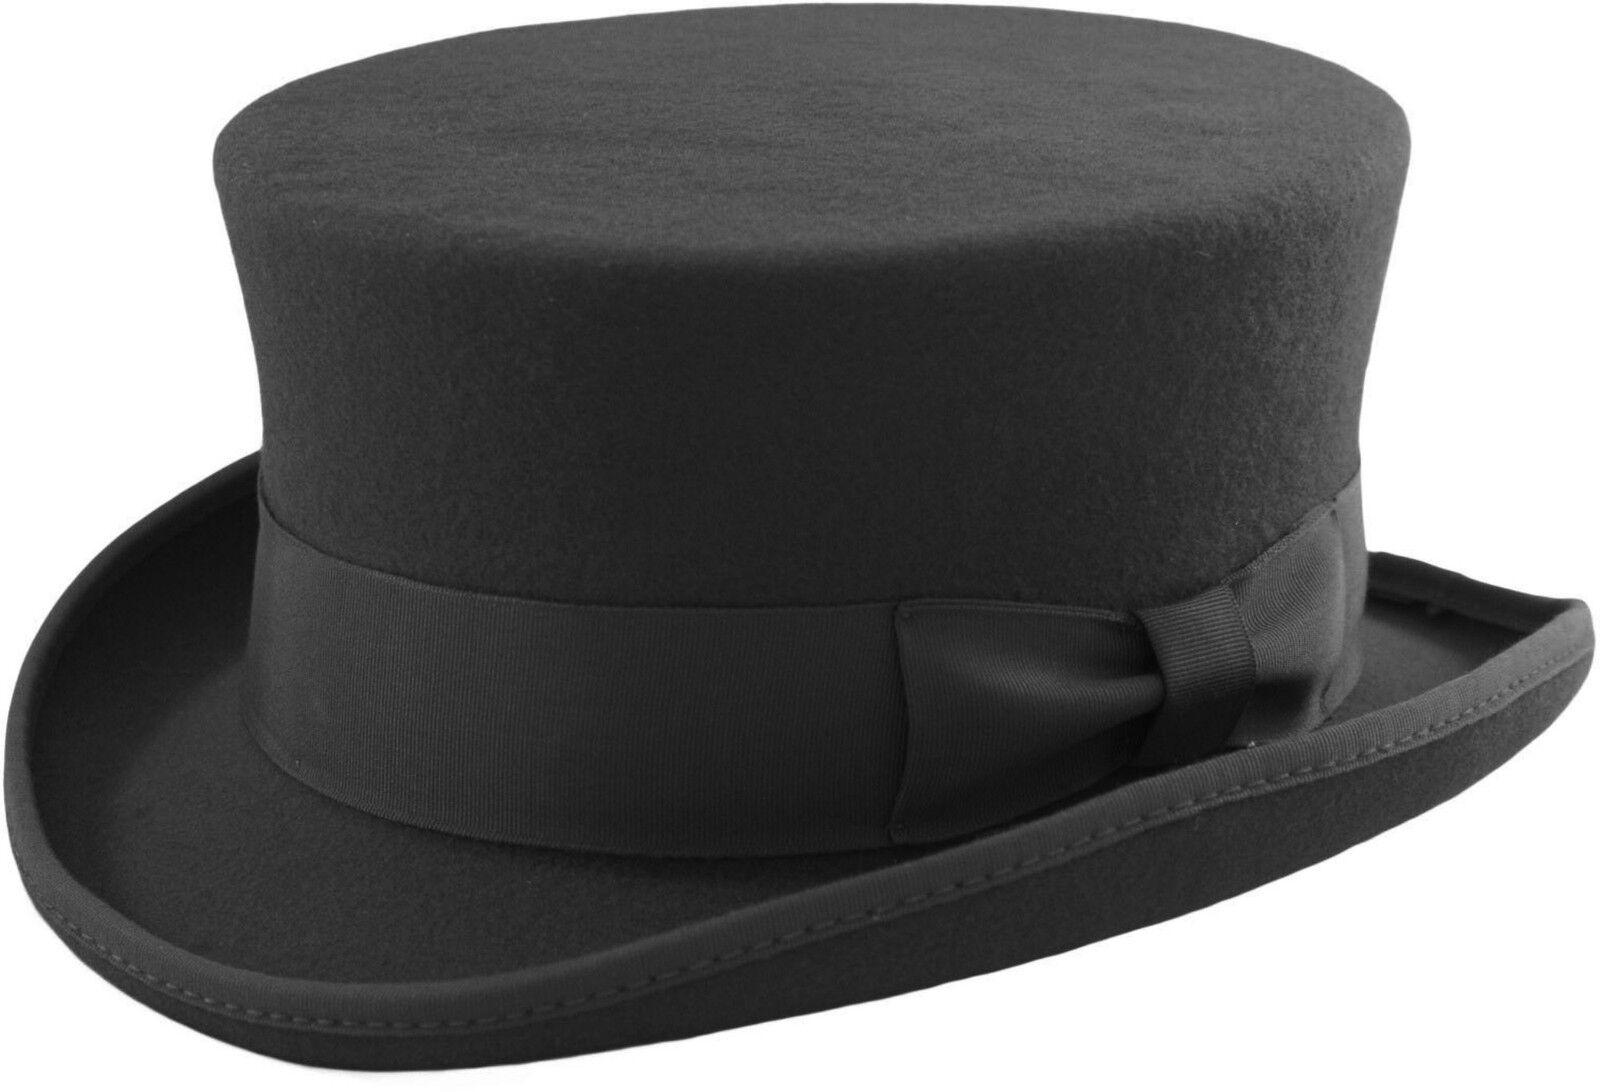 Hombres mujeres Unisex negro 100% lana Doma Topper caballo ecuestre sombrero  nuevo. a2ce28a9470